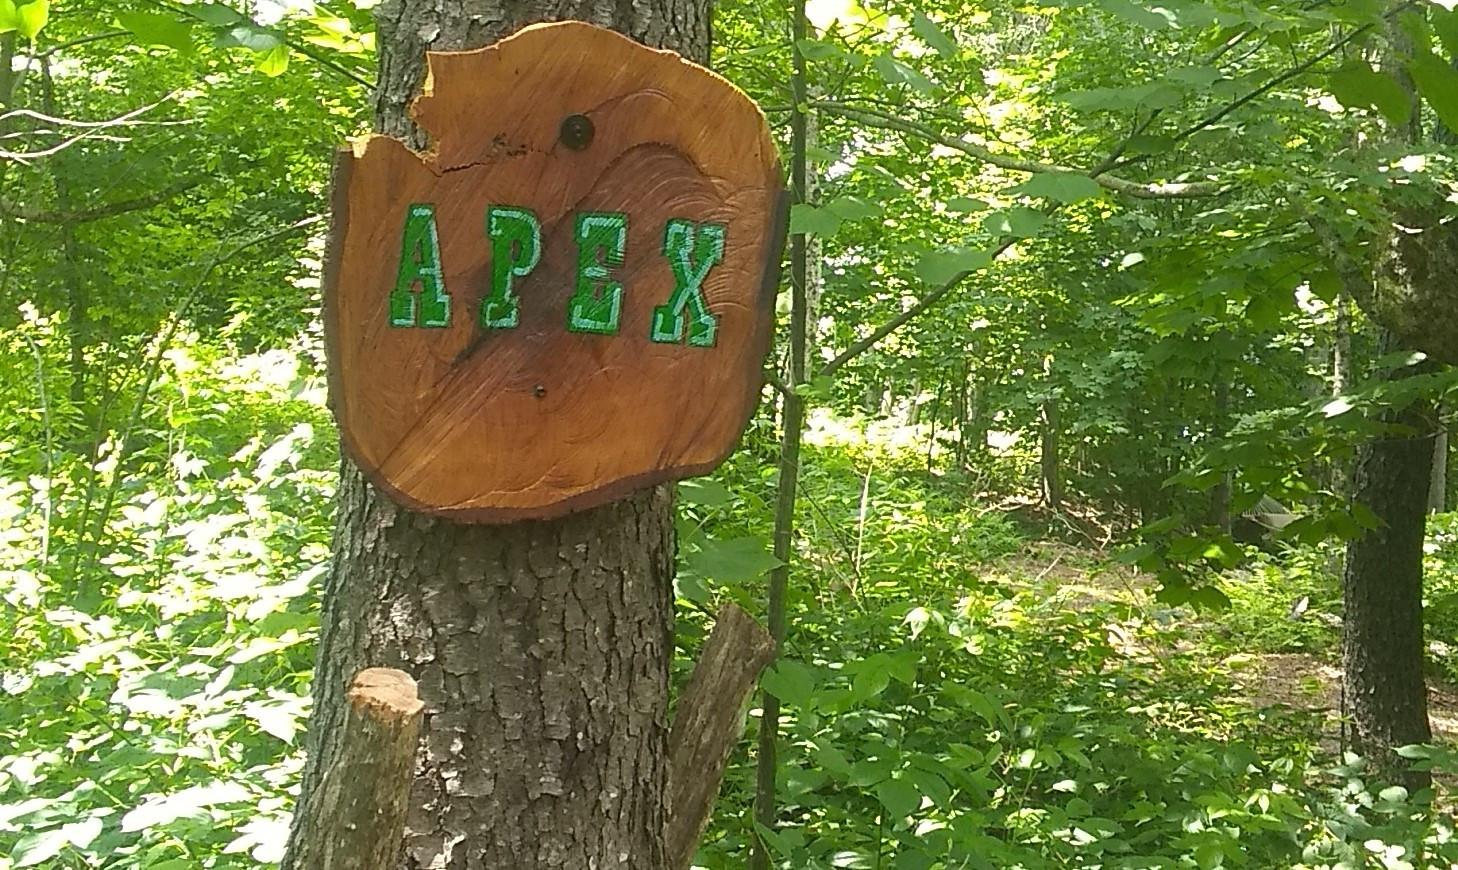 Apex Sign.jpg